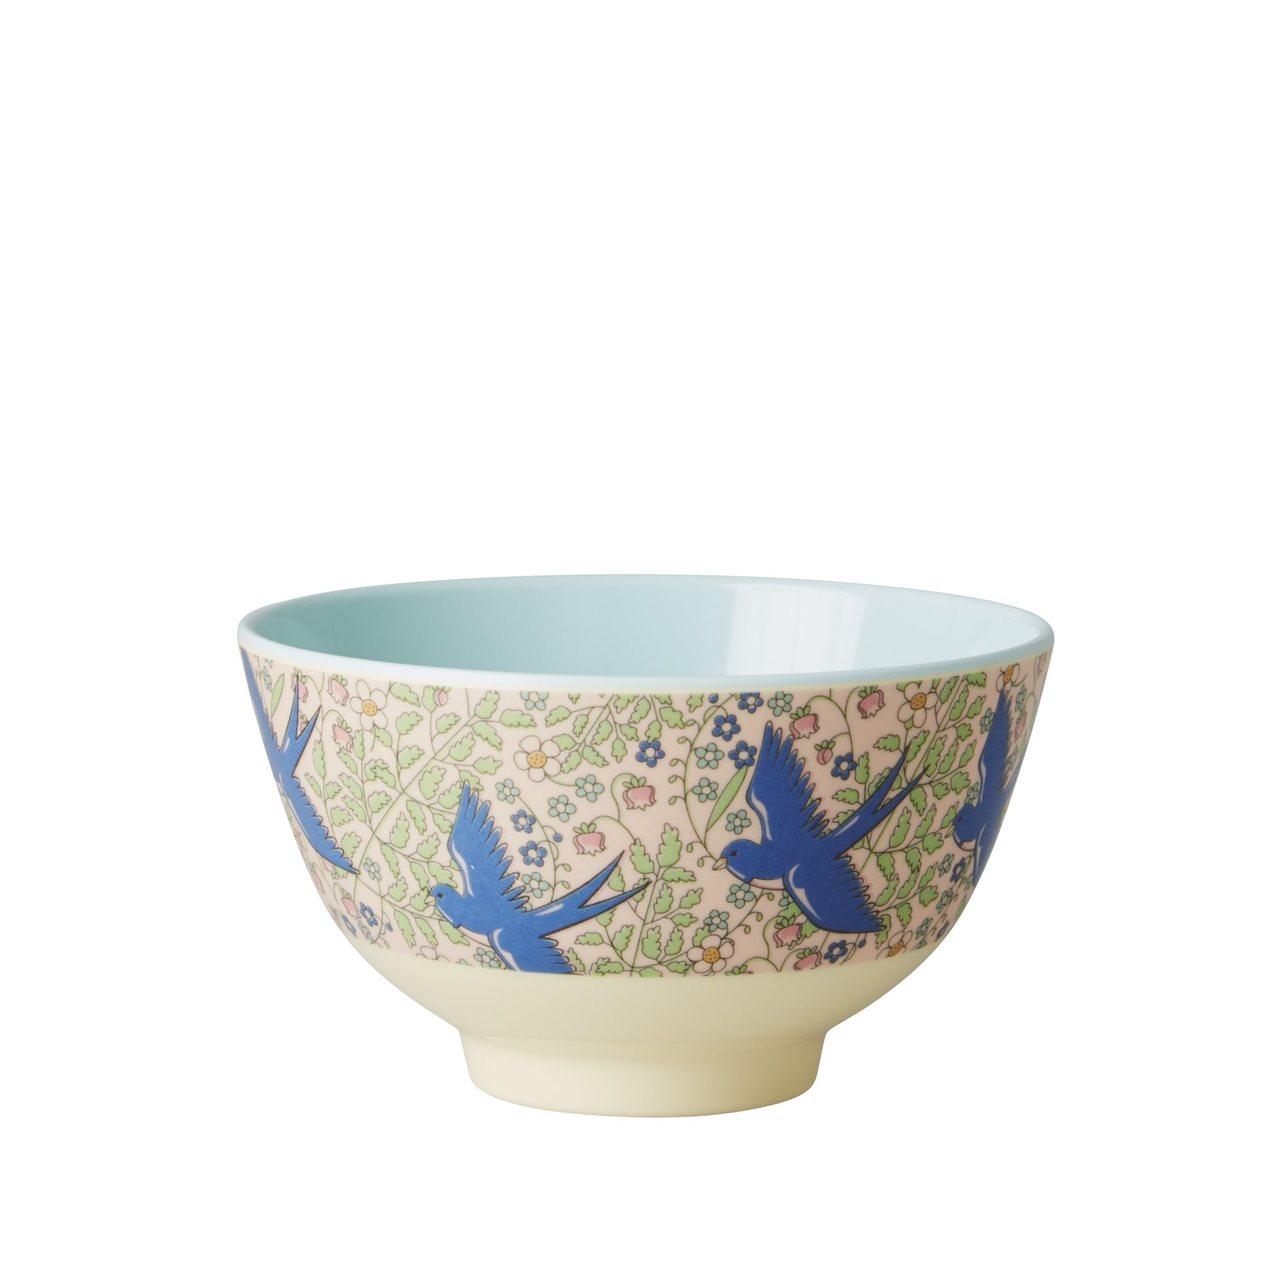 Small melamine bowl, Swallow Print